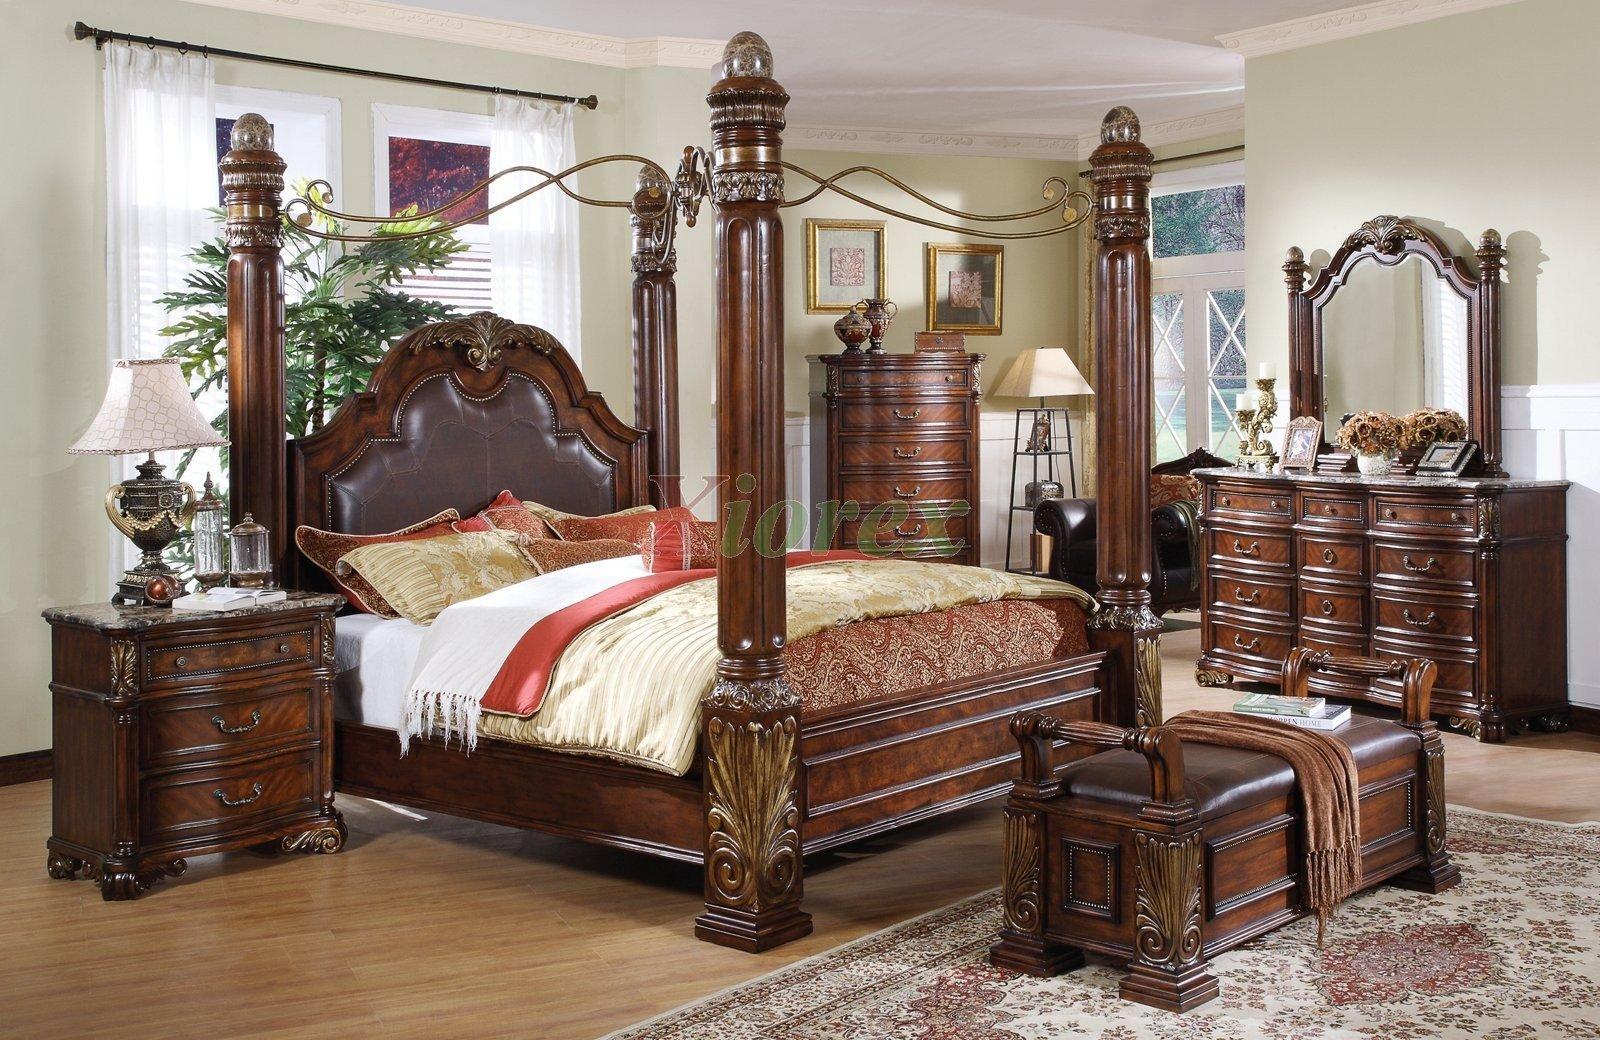 Paul Bunyan Bedroom Set Awesome Bedroom Best King Size Canopy Bed for Elegant Master